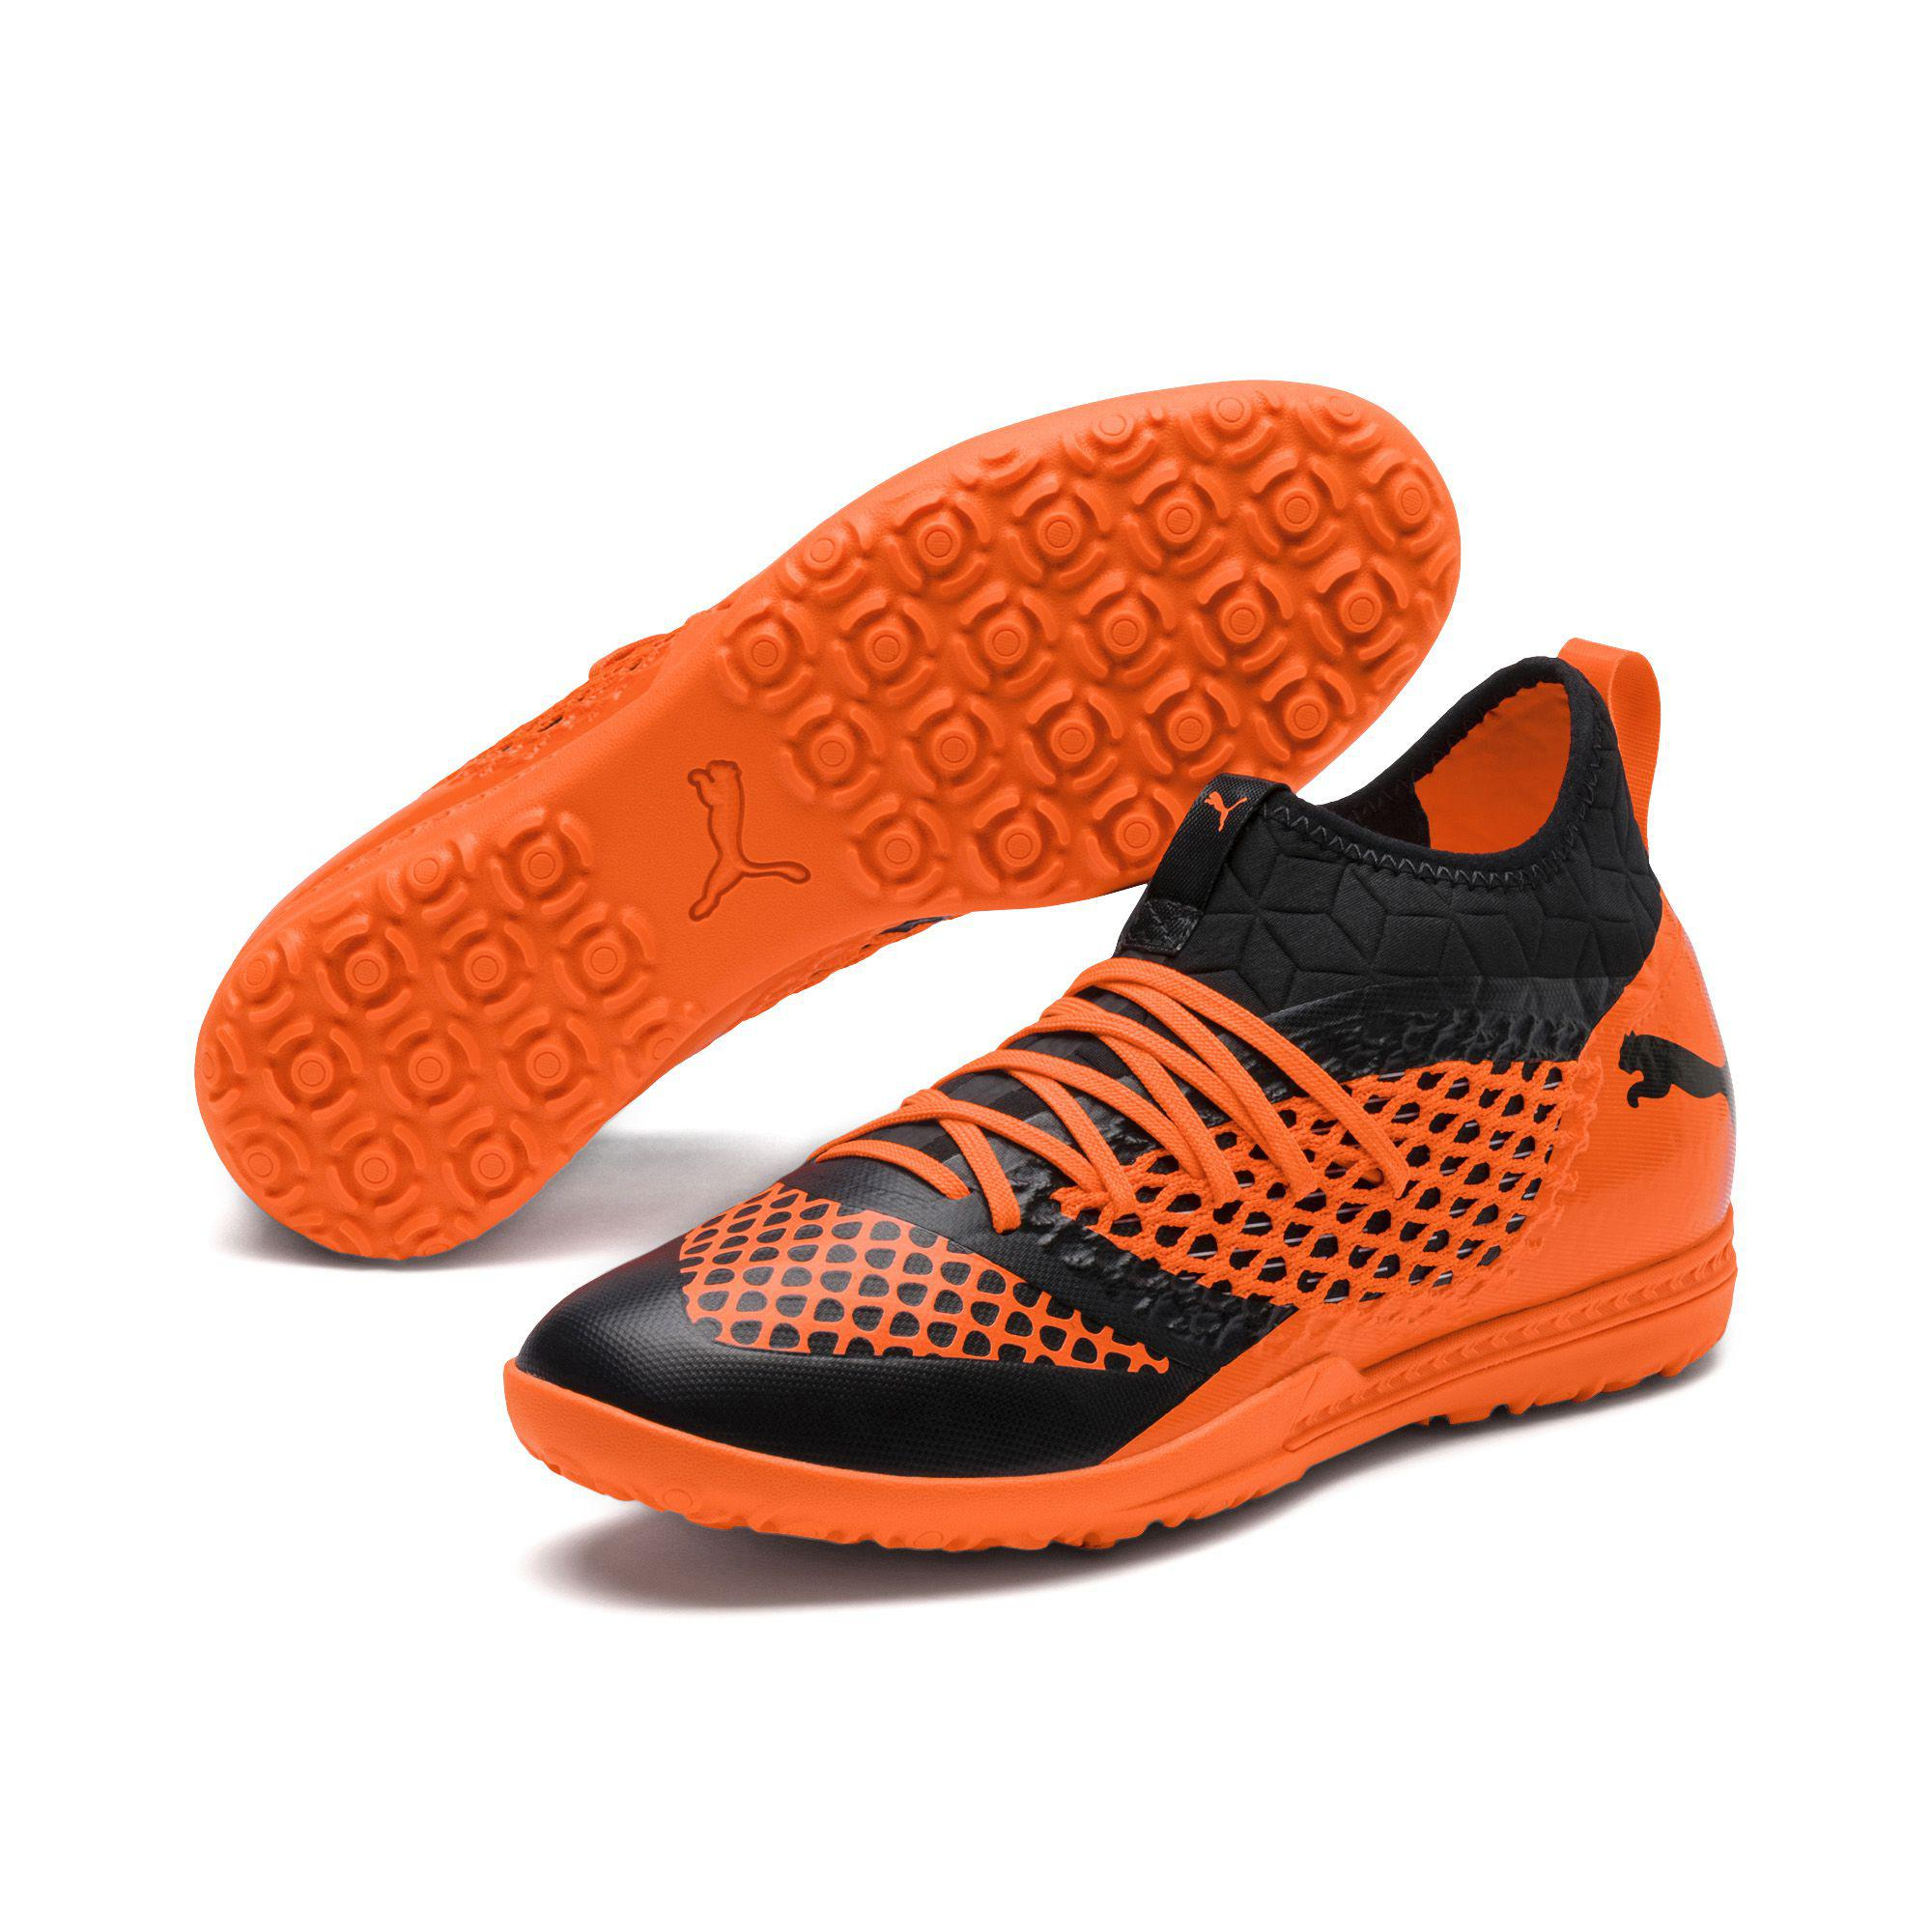 c9924207d11b ... clearance puma orange future 2.3 netfit tt for men lyst. view  fullscreen 99868 a4d5f